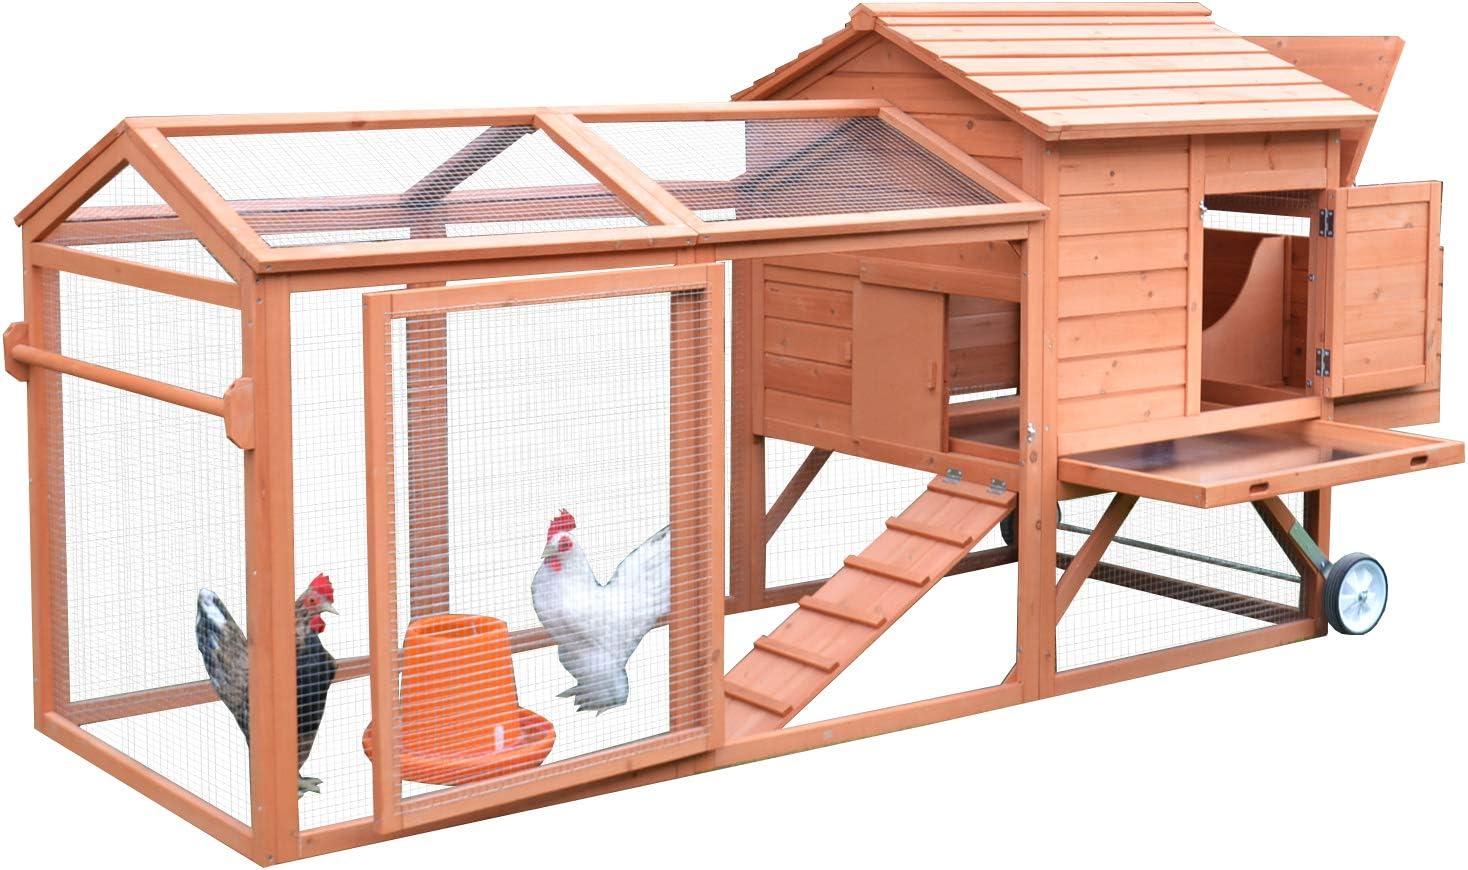 "B00GU2W54Q PawHut 98"" Portable Wooden Chicken Coop With Wheels Outdoor Run and Nesting Box 71GAV854gUL"